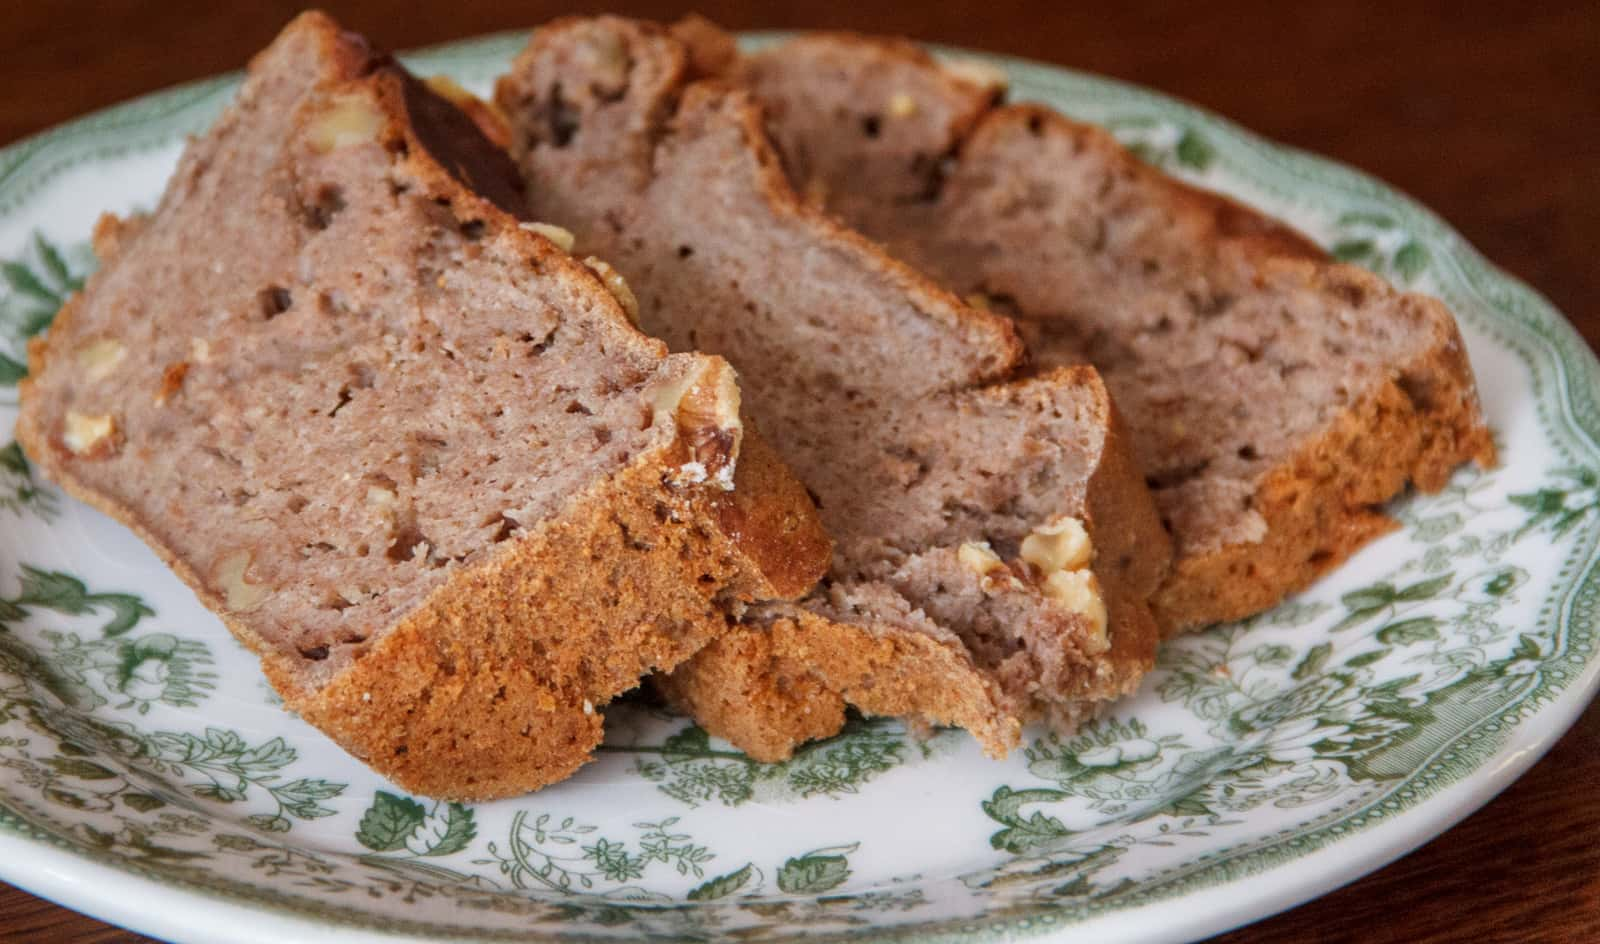 Plakjes bananenbrood op een bordje